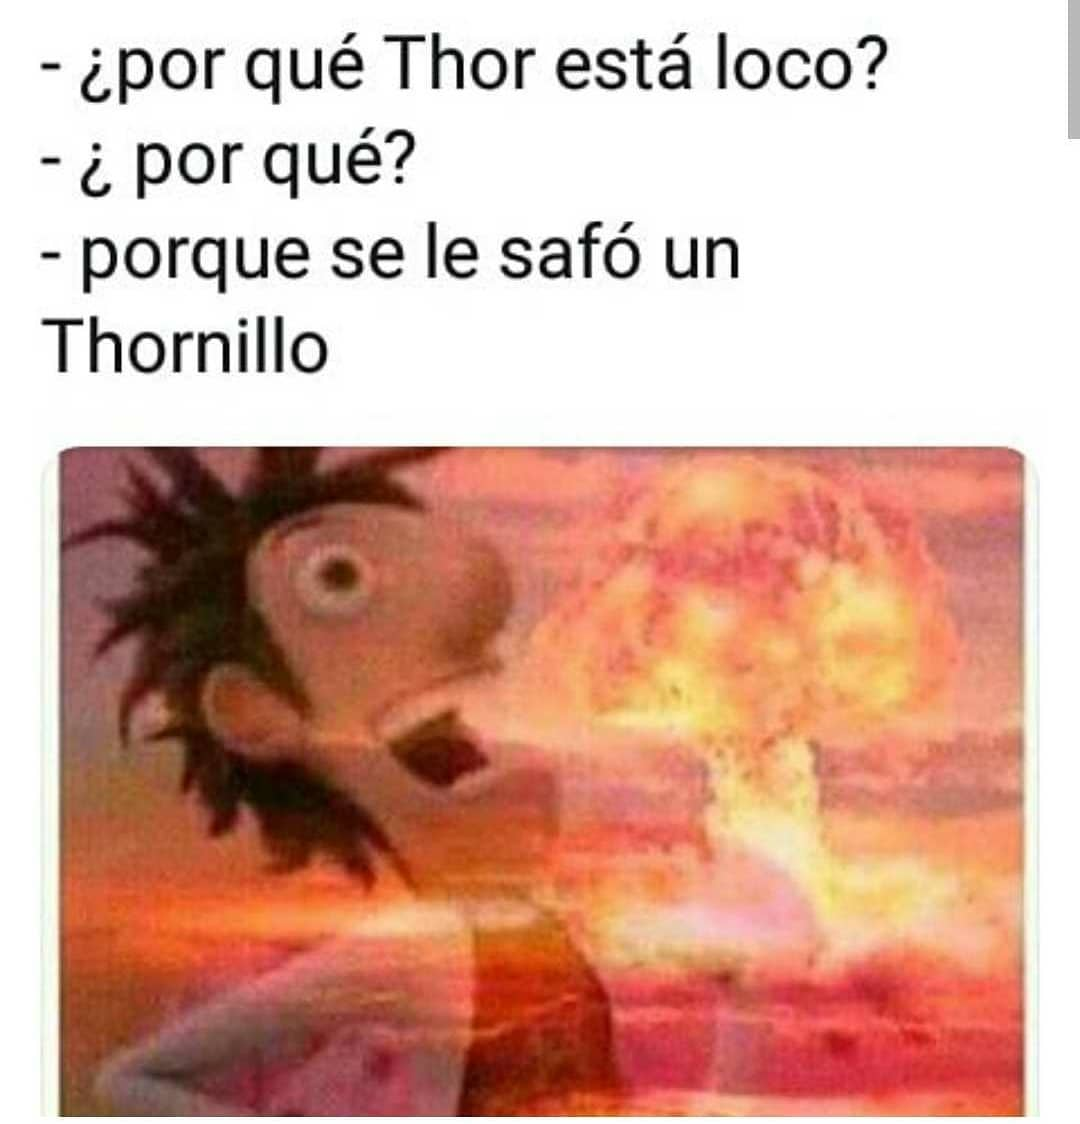 ¿Por qué Thor está loco?  ¿Por qué?  Porque se le safó un Thornillo.